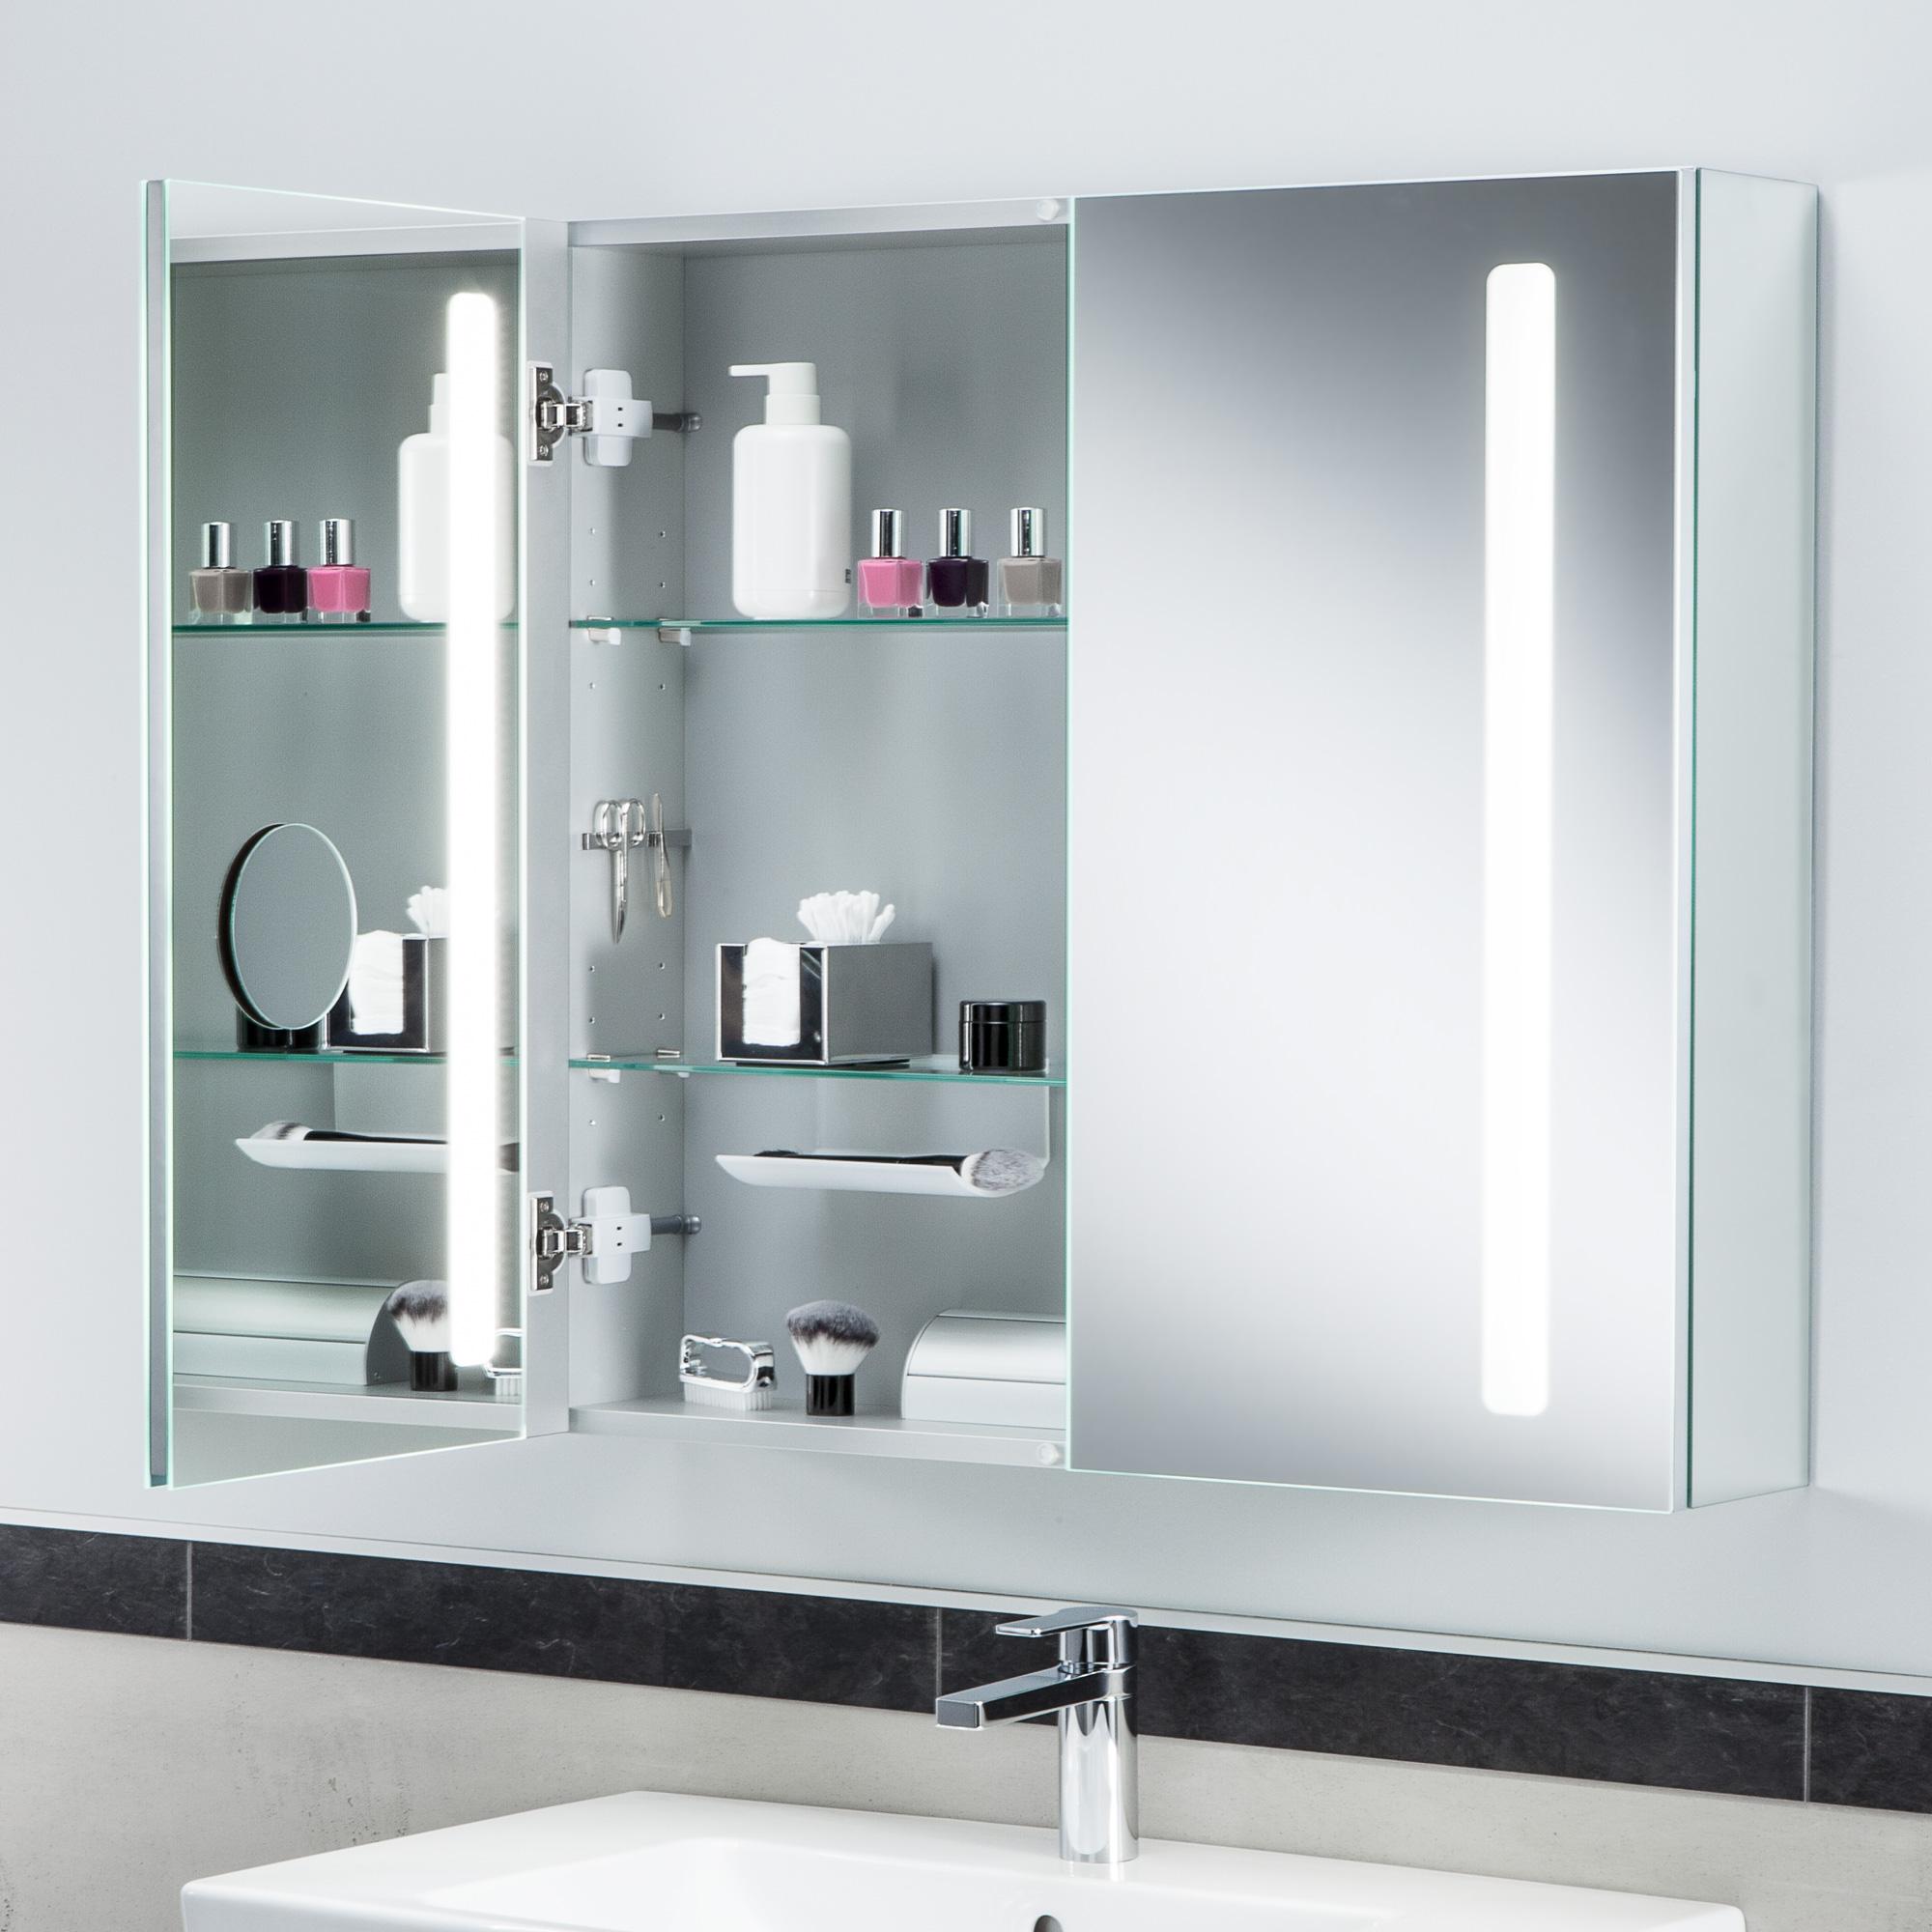 villeroy boch my view 14 spiegelschrank mit led beleuchtung dimmbar a4218000 reuter. Black Bedroom Furniture Sets. Home Design Ideas